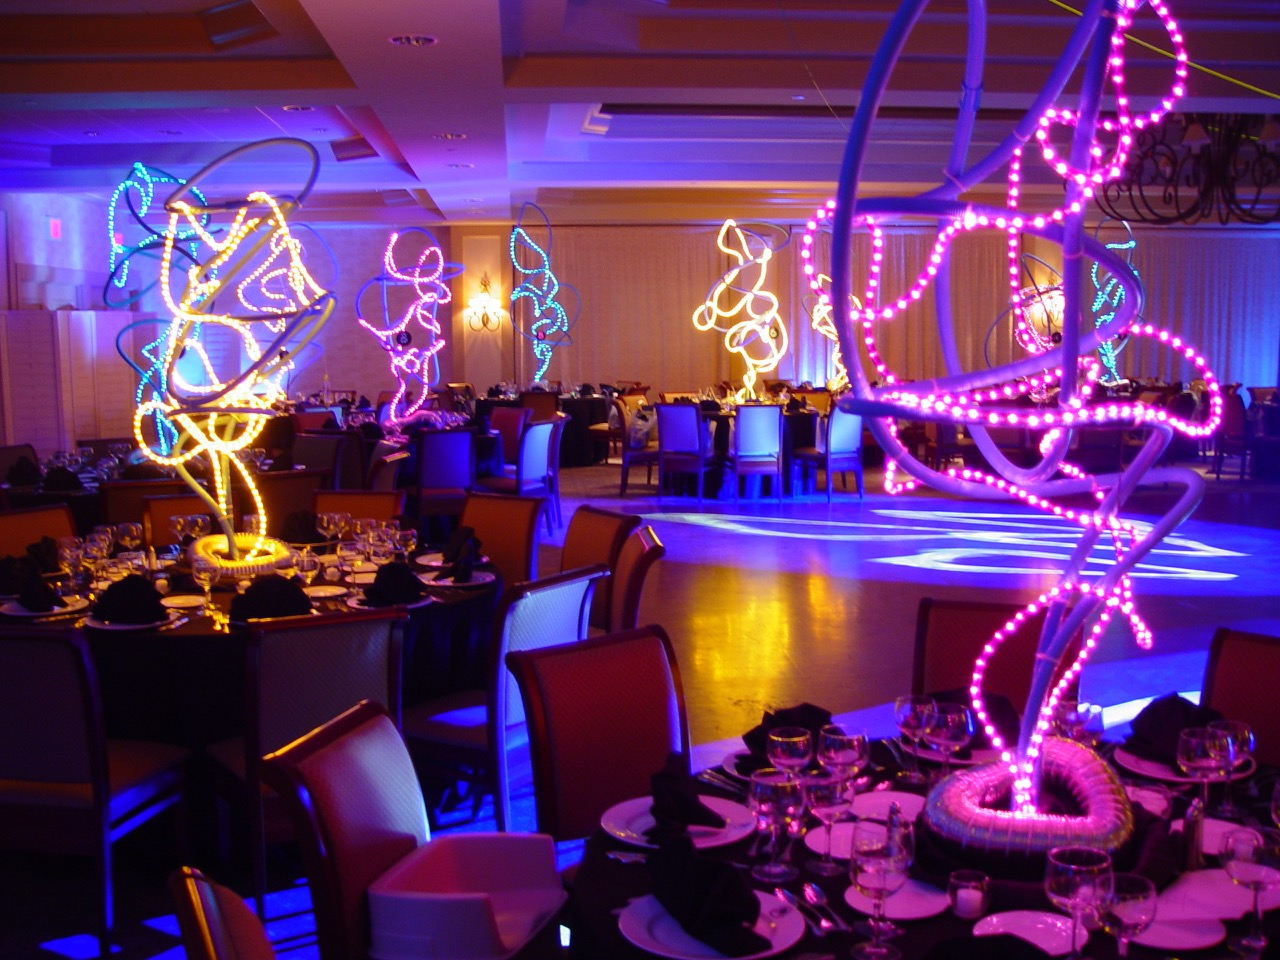 Event Decor Design Lighting NJ NYC Eggsotic Events NJs Best Event Decorator Event Lighting Event Design Wedding Bar Mitzvah Bat Mitzvah Gala Fundraiser 29.jpg